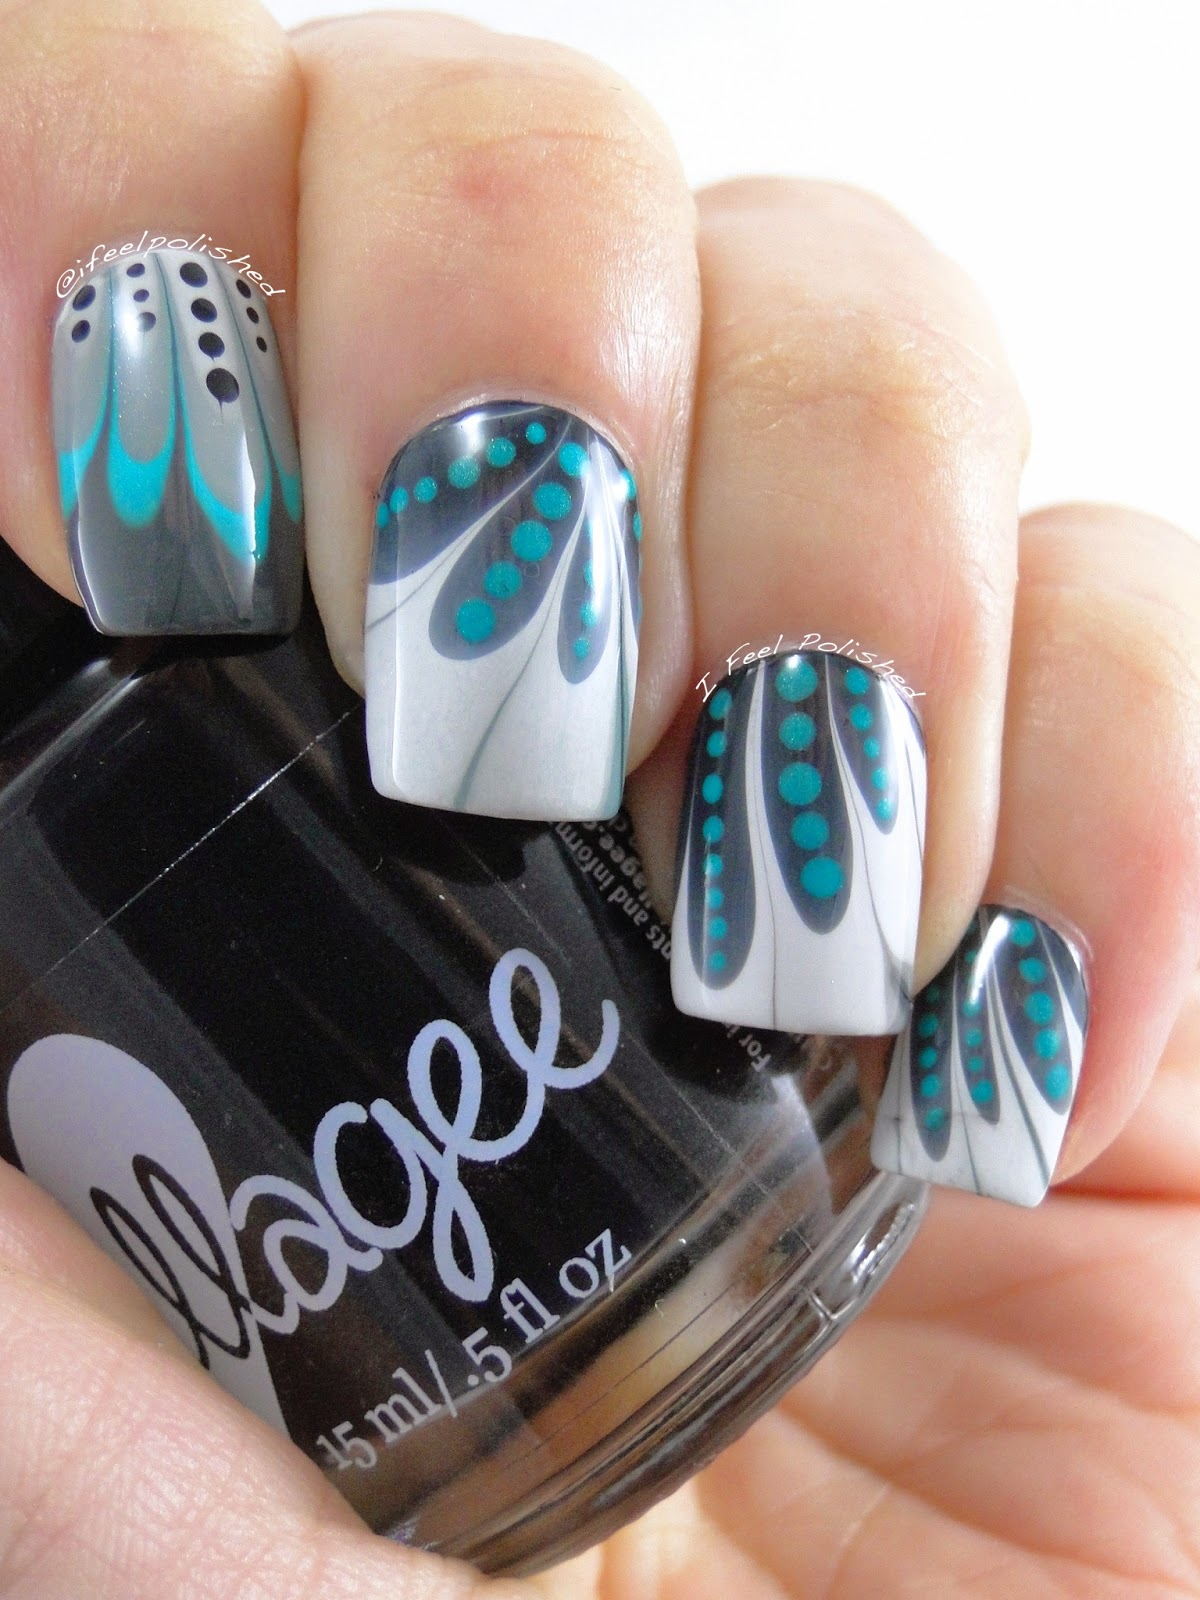 I Feel Polished!: Dressy Water Marble